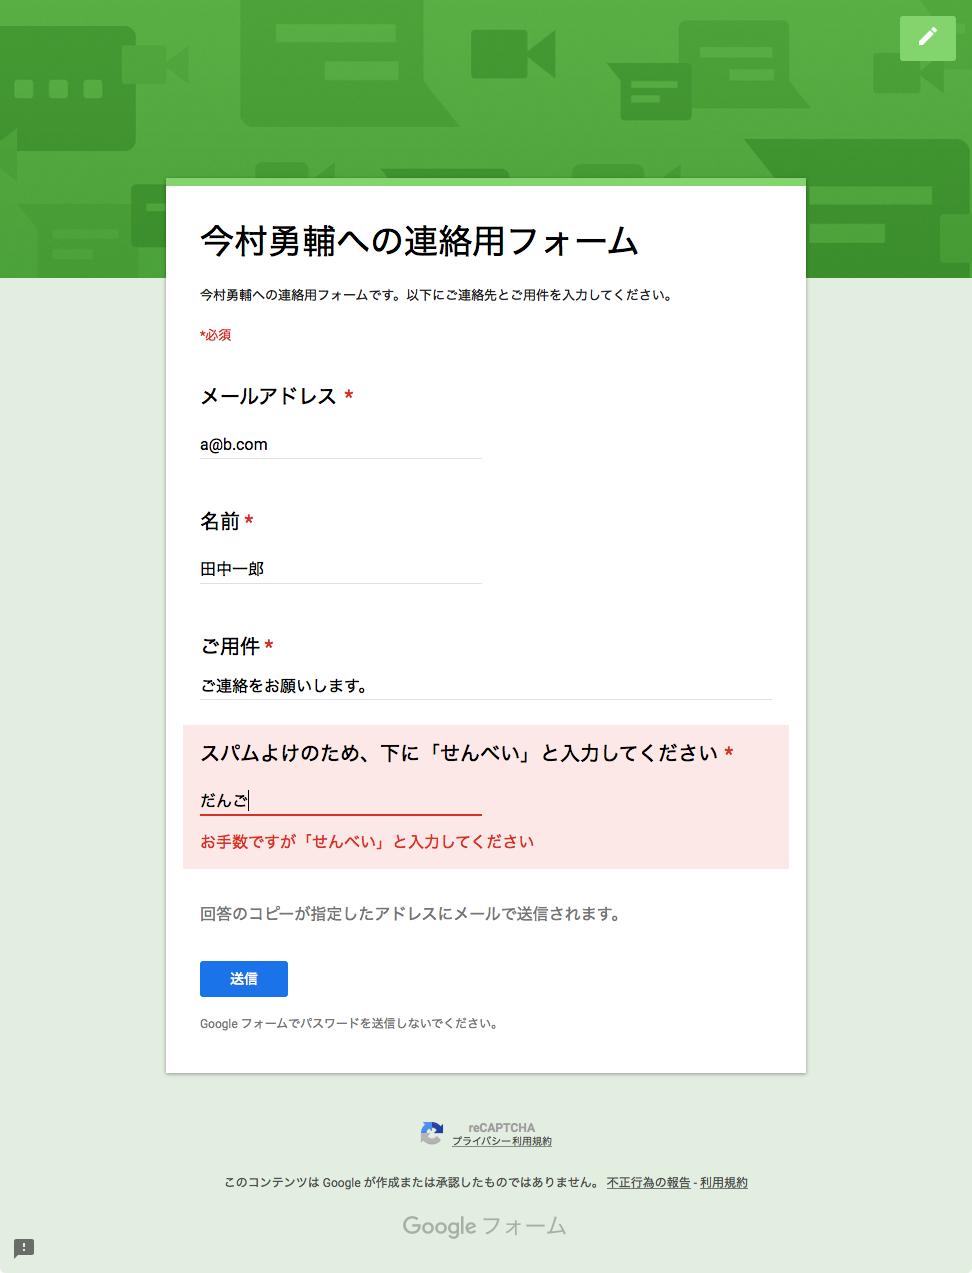 f:id:Imamura:20191013145028p:plain